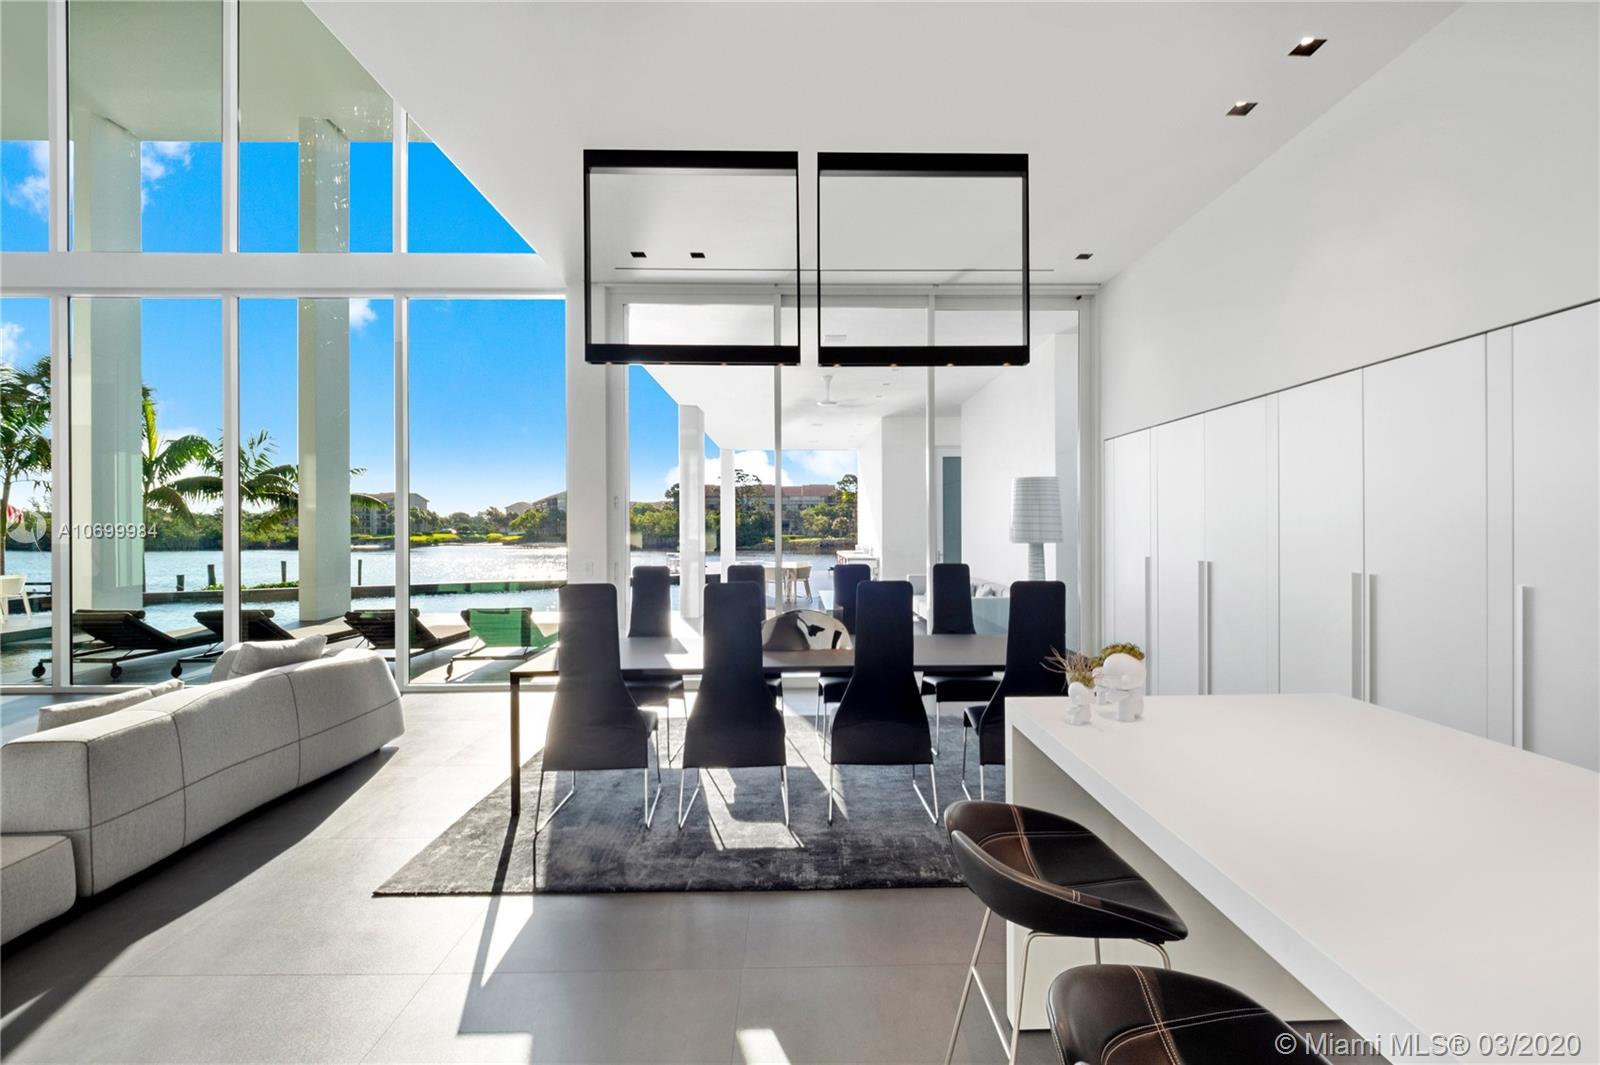 Homes for Sale in Zip Code 33410